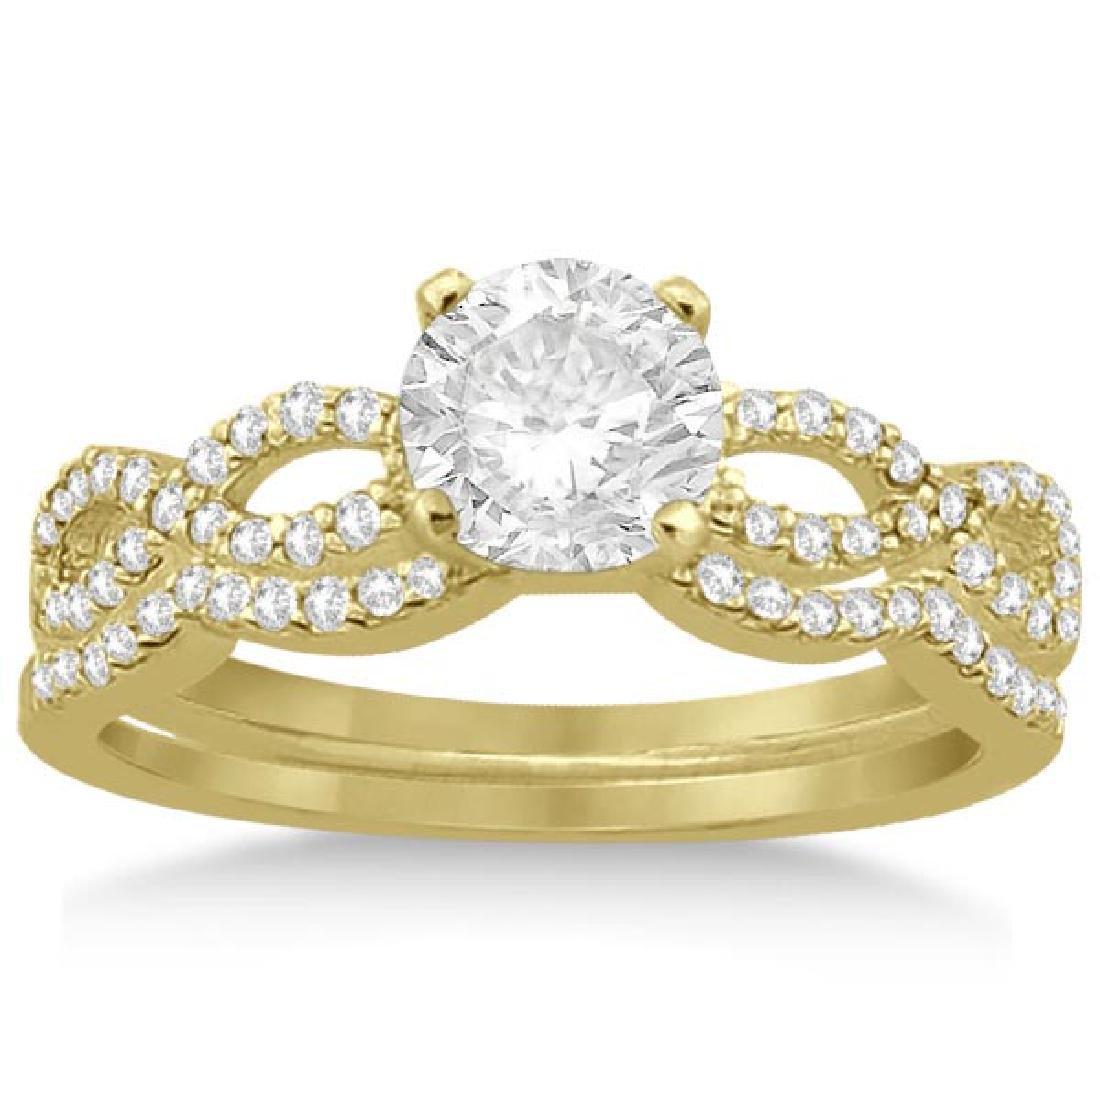 Infinity Twisted Diamond Matching Bridal Set in 14K Yel